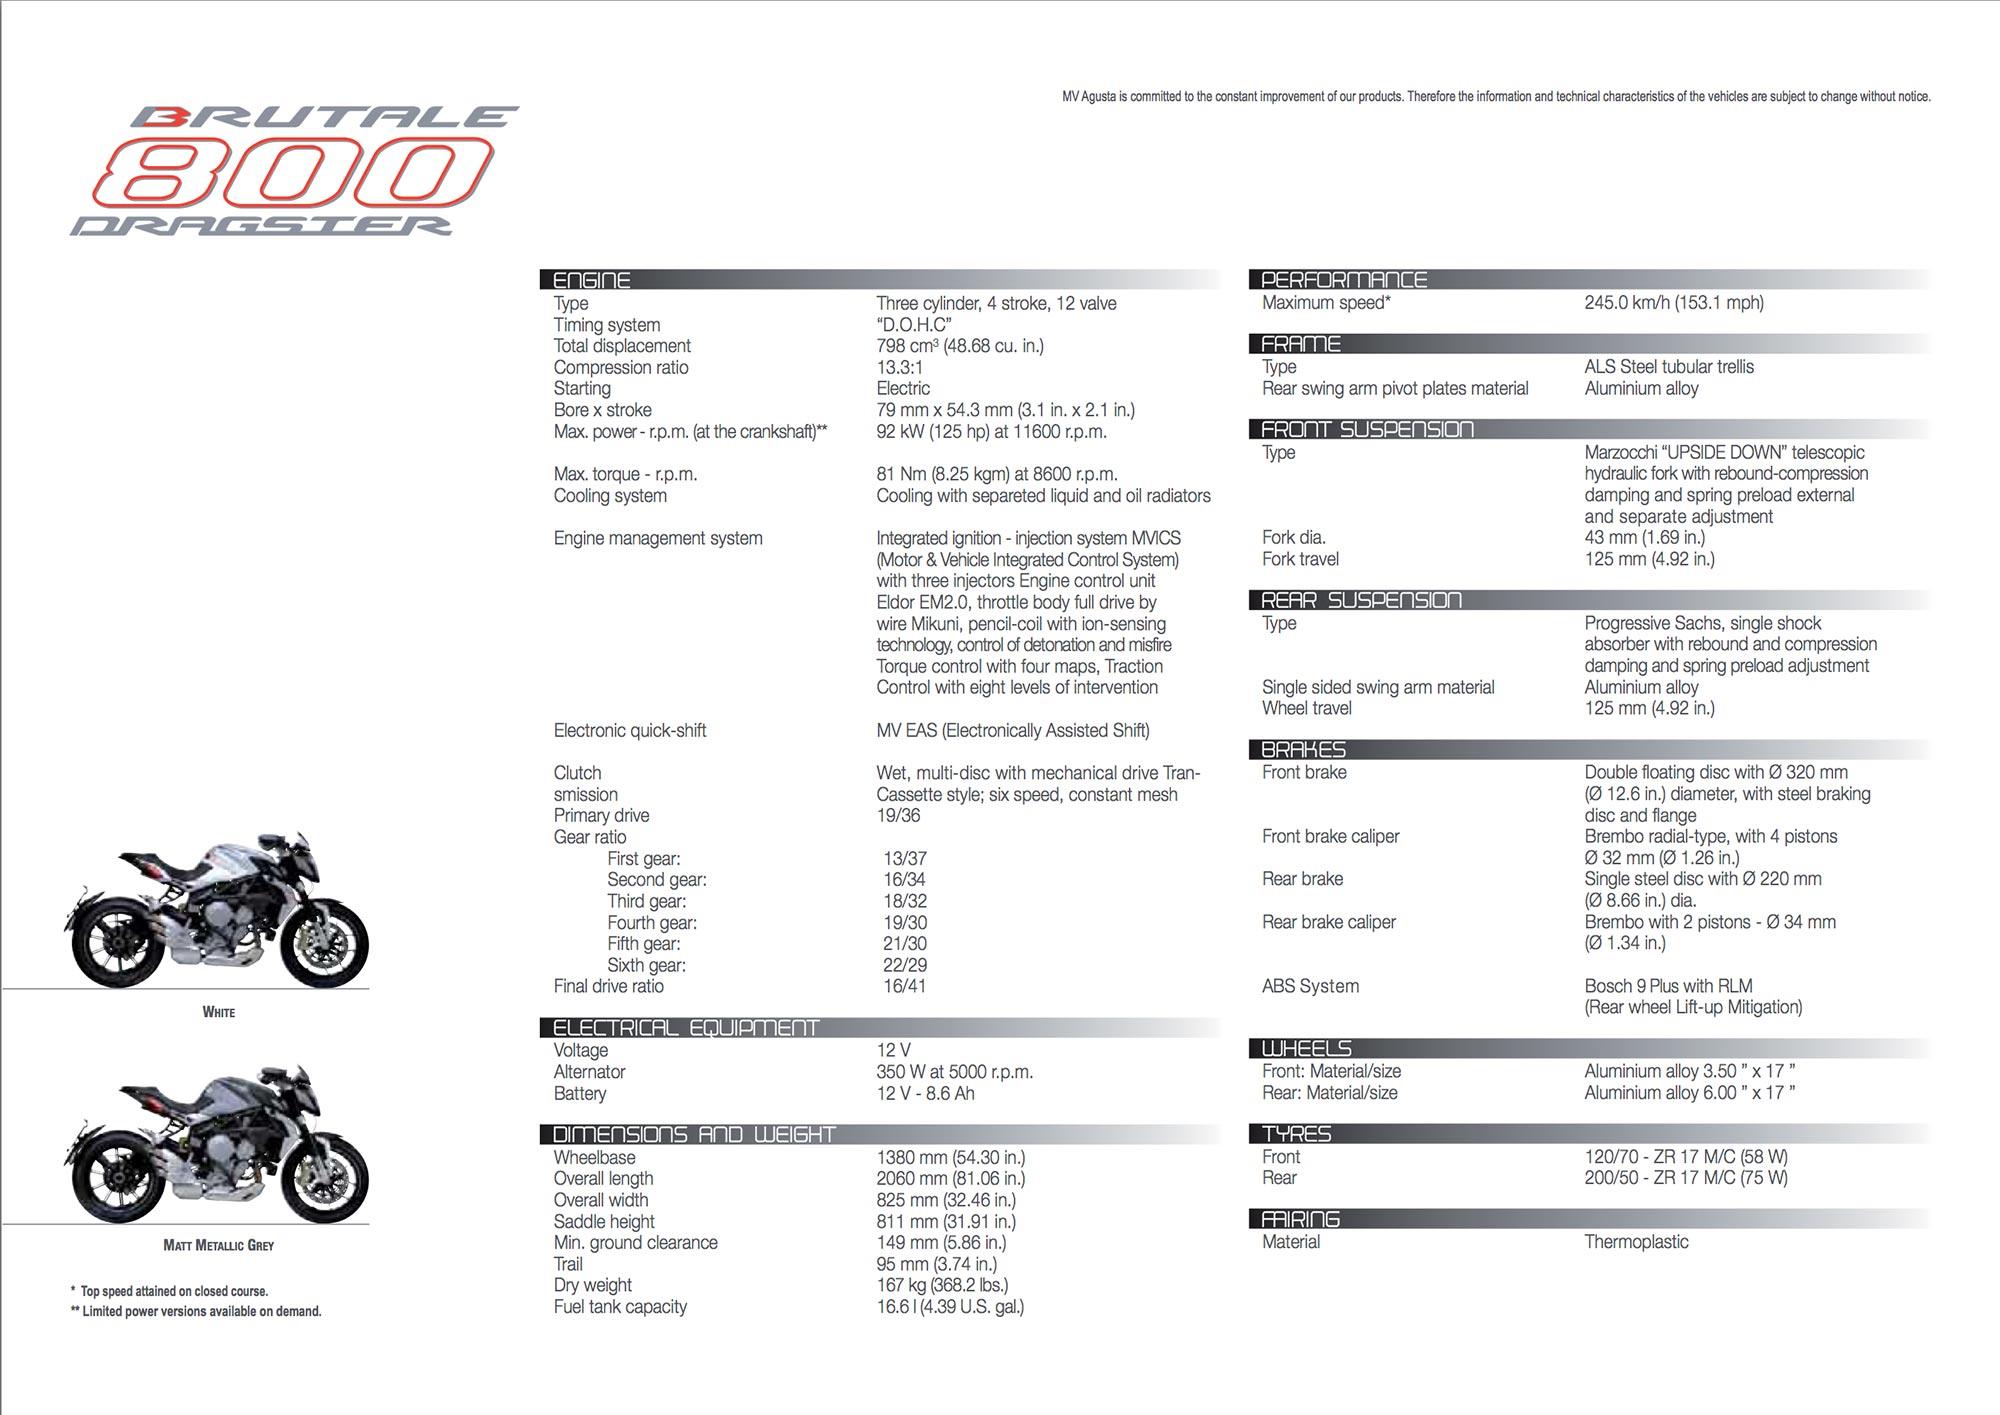 mv-agusta-brutale-dragster-800-technical-specifications.jpg